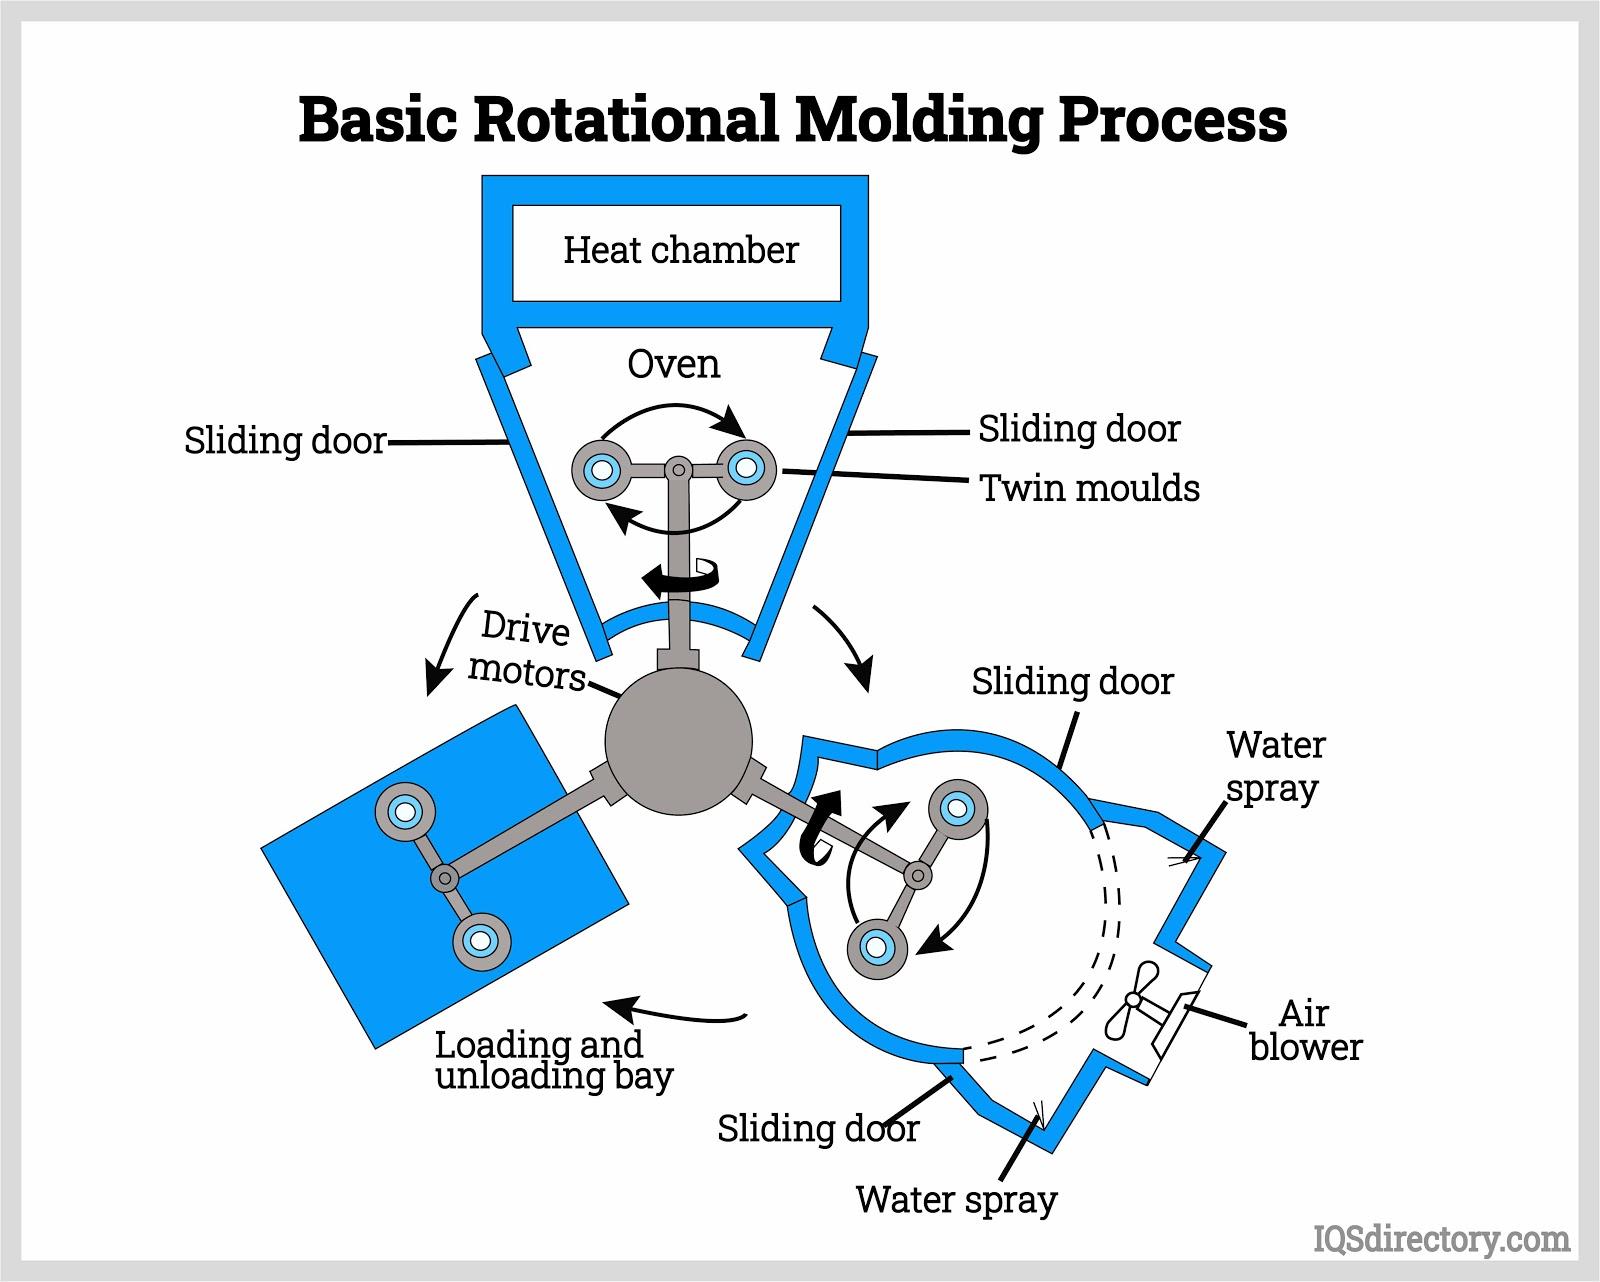 Basic Rotational Molding Process